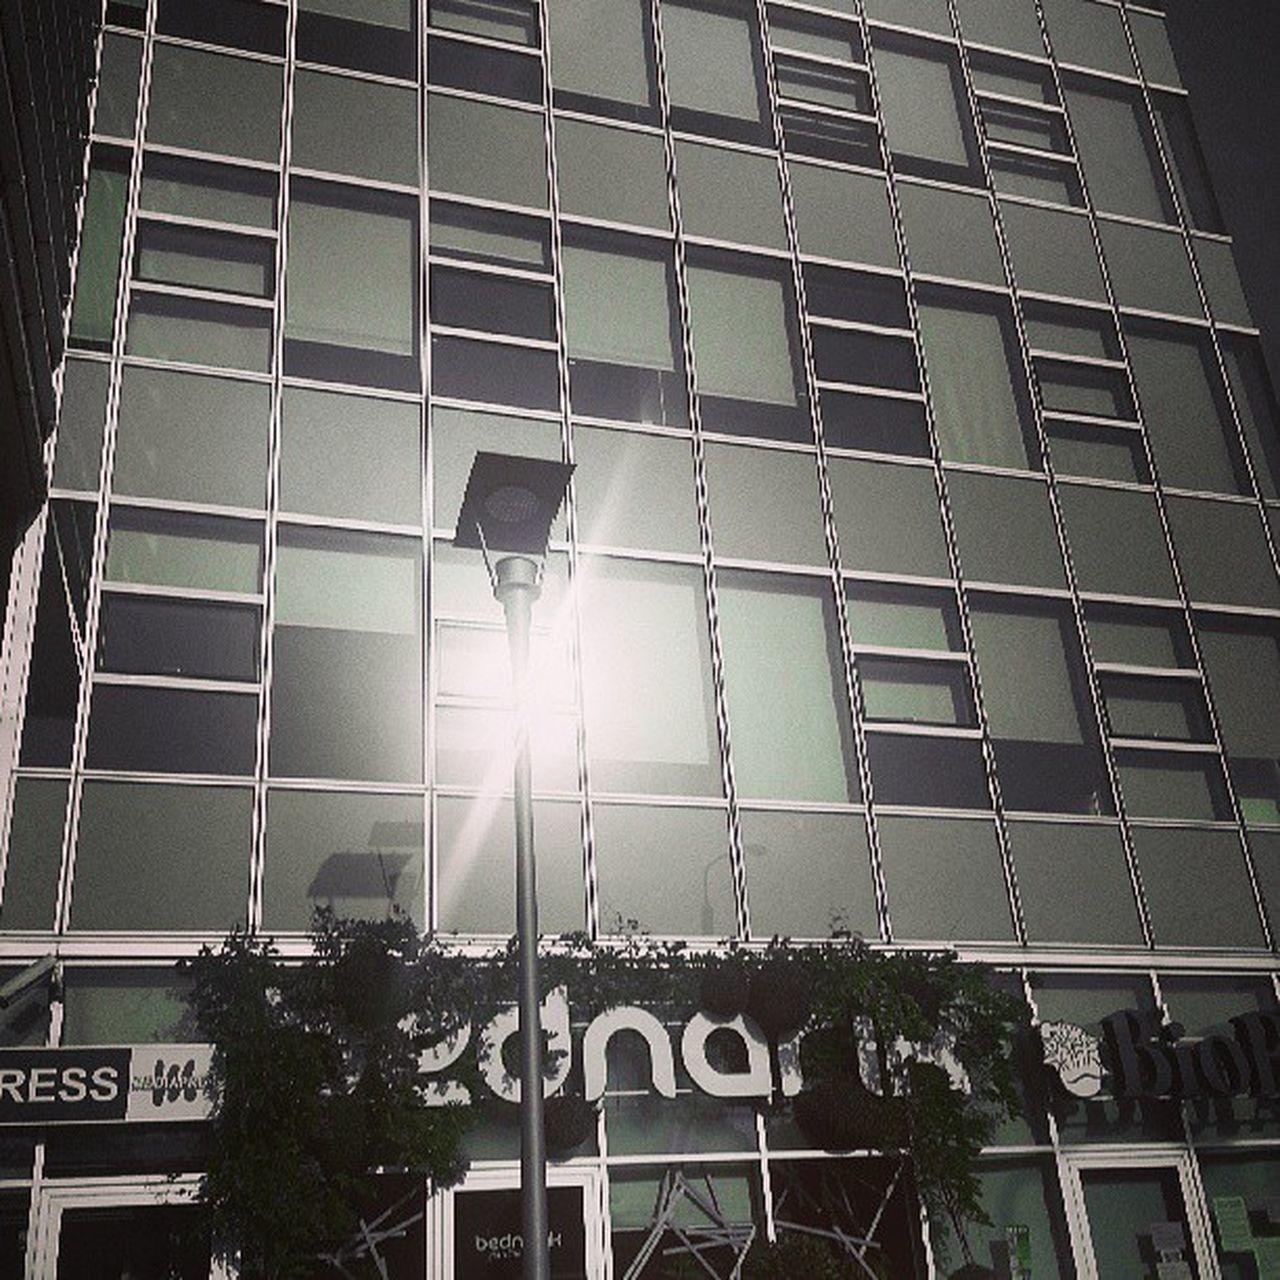 Sun Reflection on the Windows of CBC building in Bratislava Slovakia